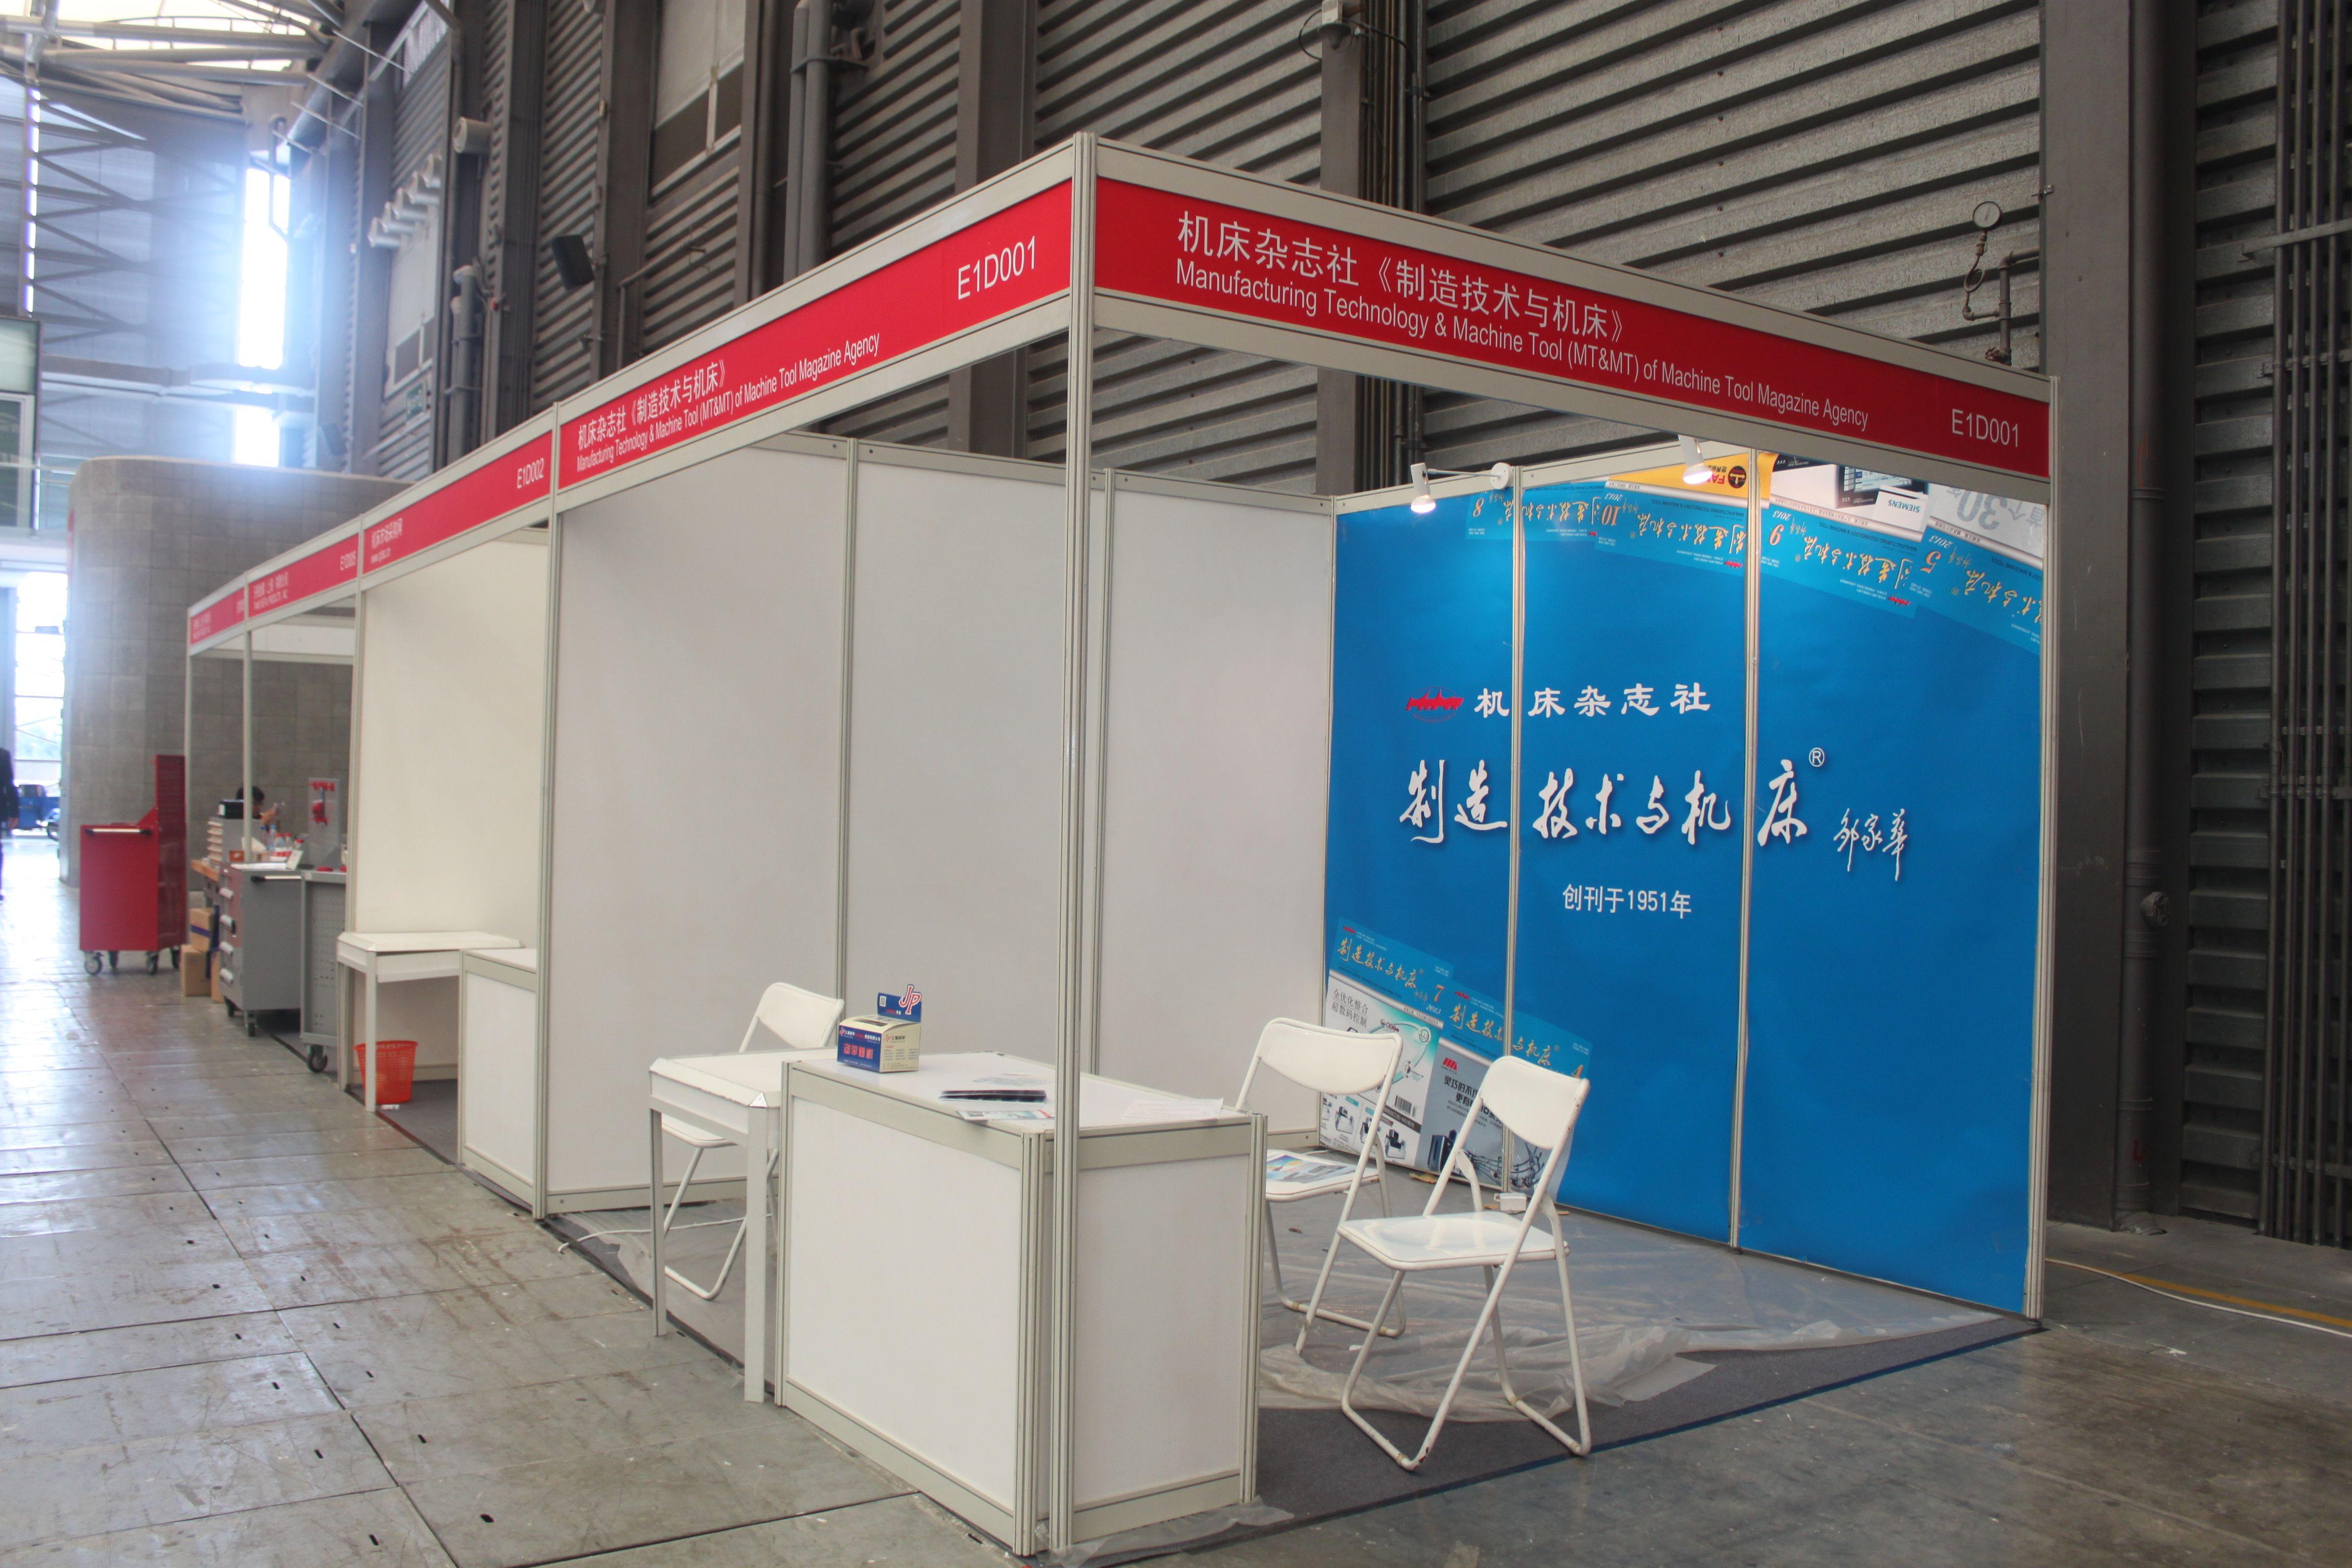 Exhibition Shell Scheme Manufacturers : Trade show 3x3 modular standard shell scheme booth from china